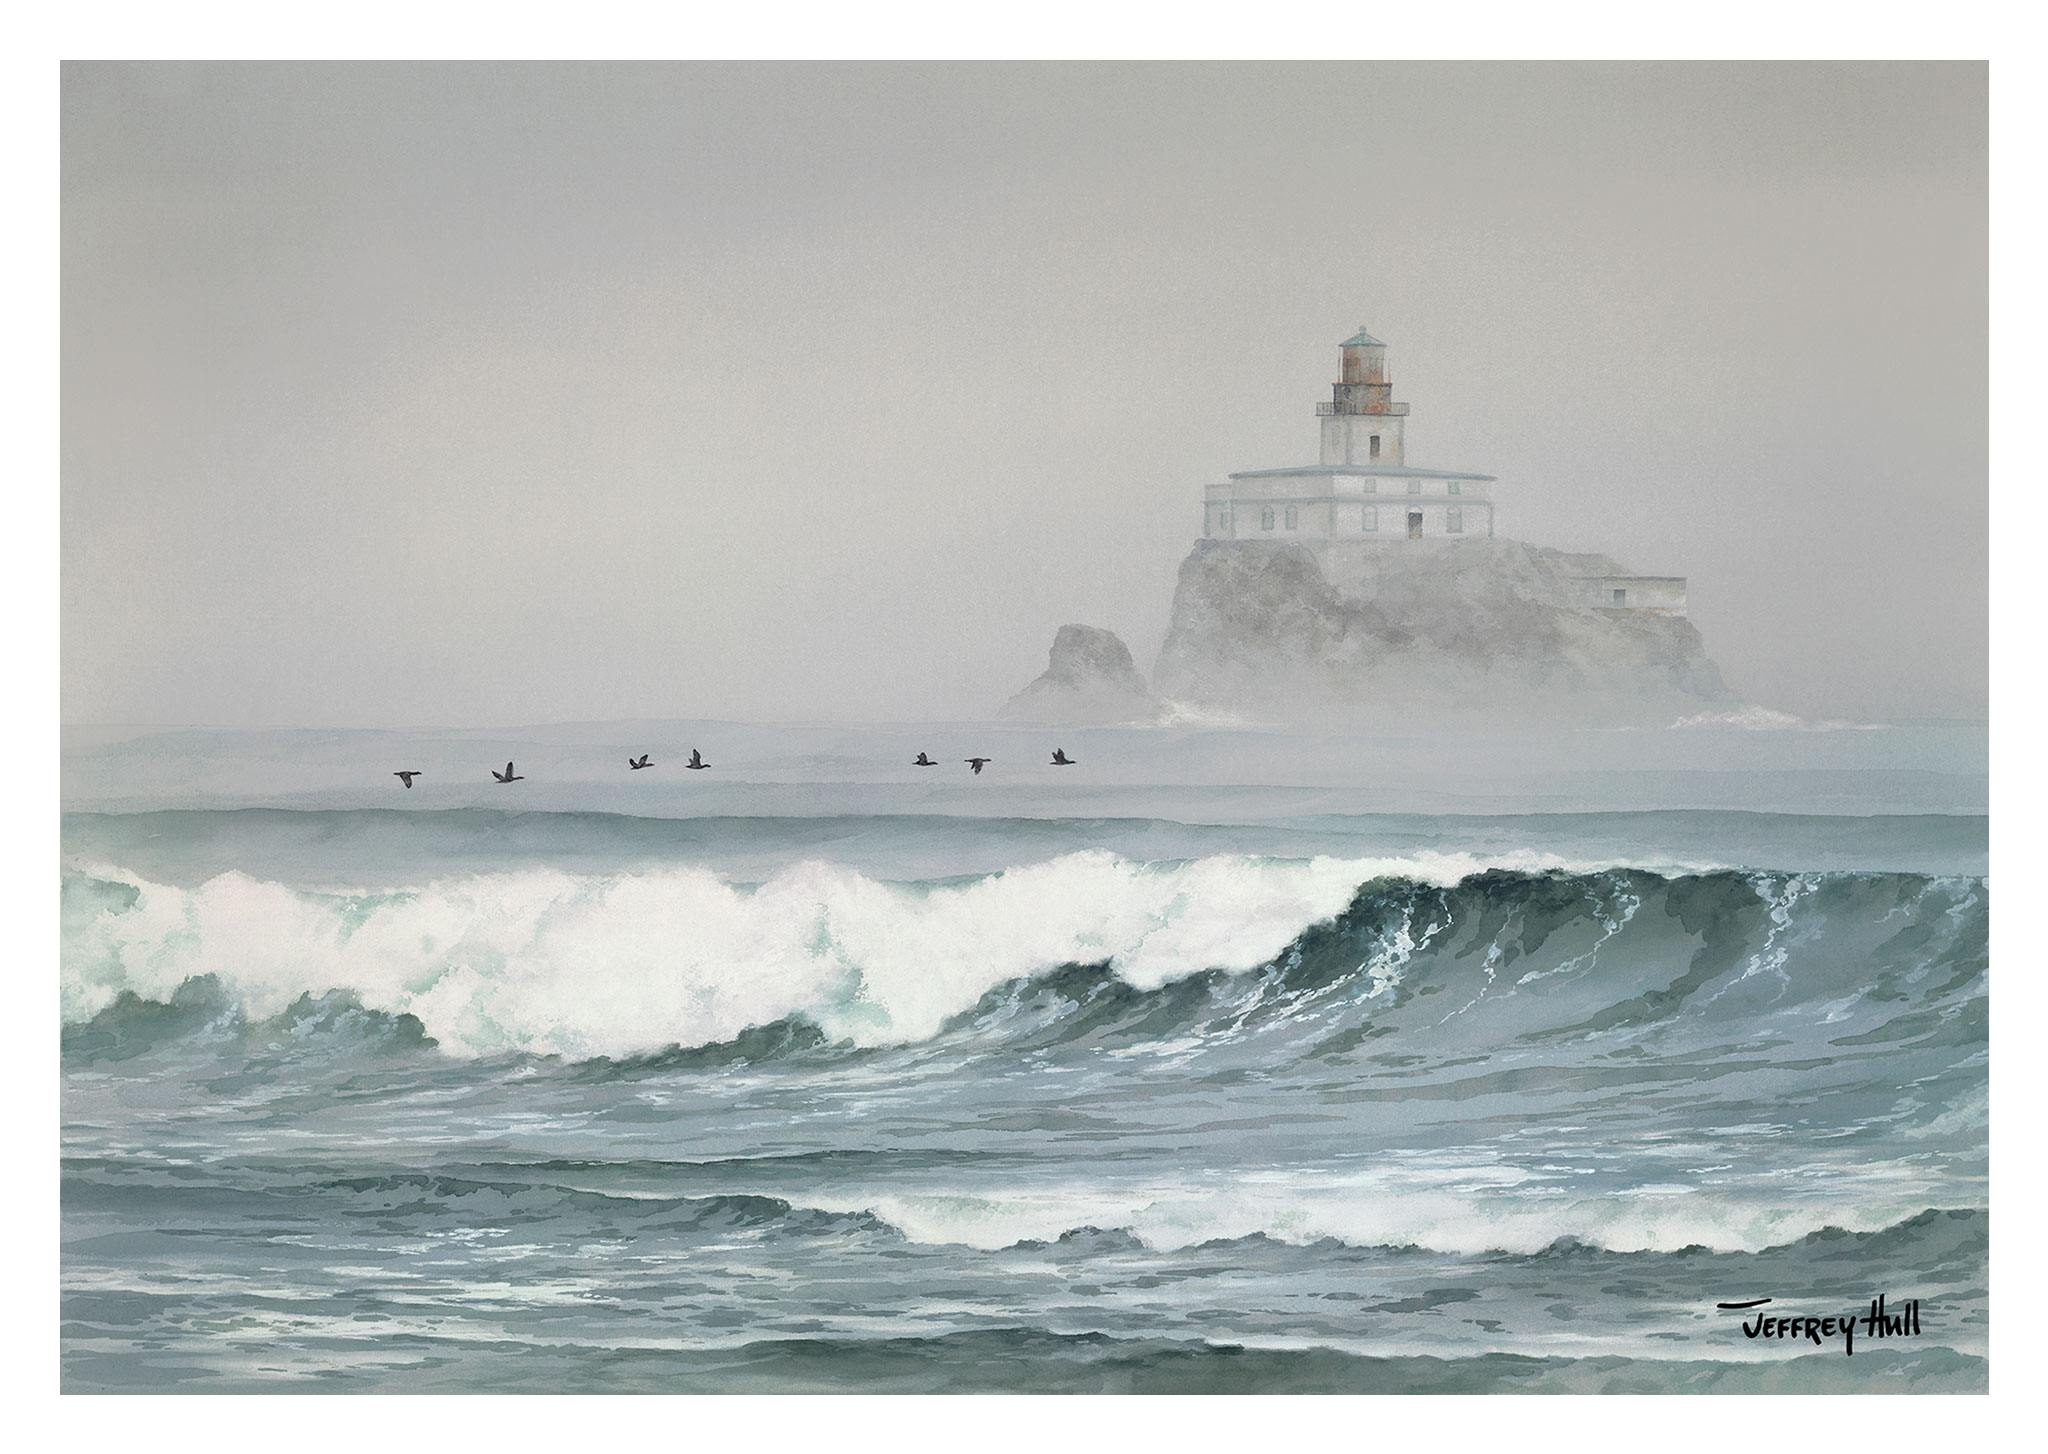 Tillamook-Rock-Lighthouse-LimEd-Unframed-4-Website-2021